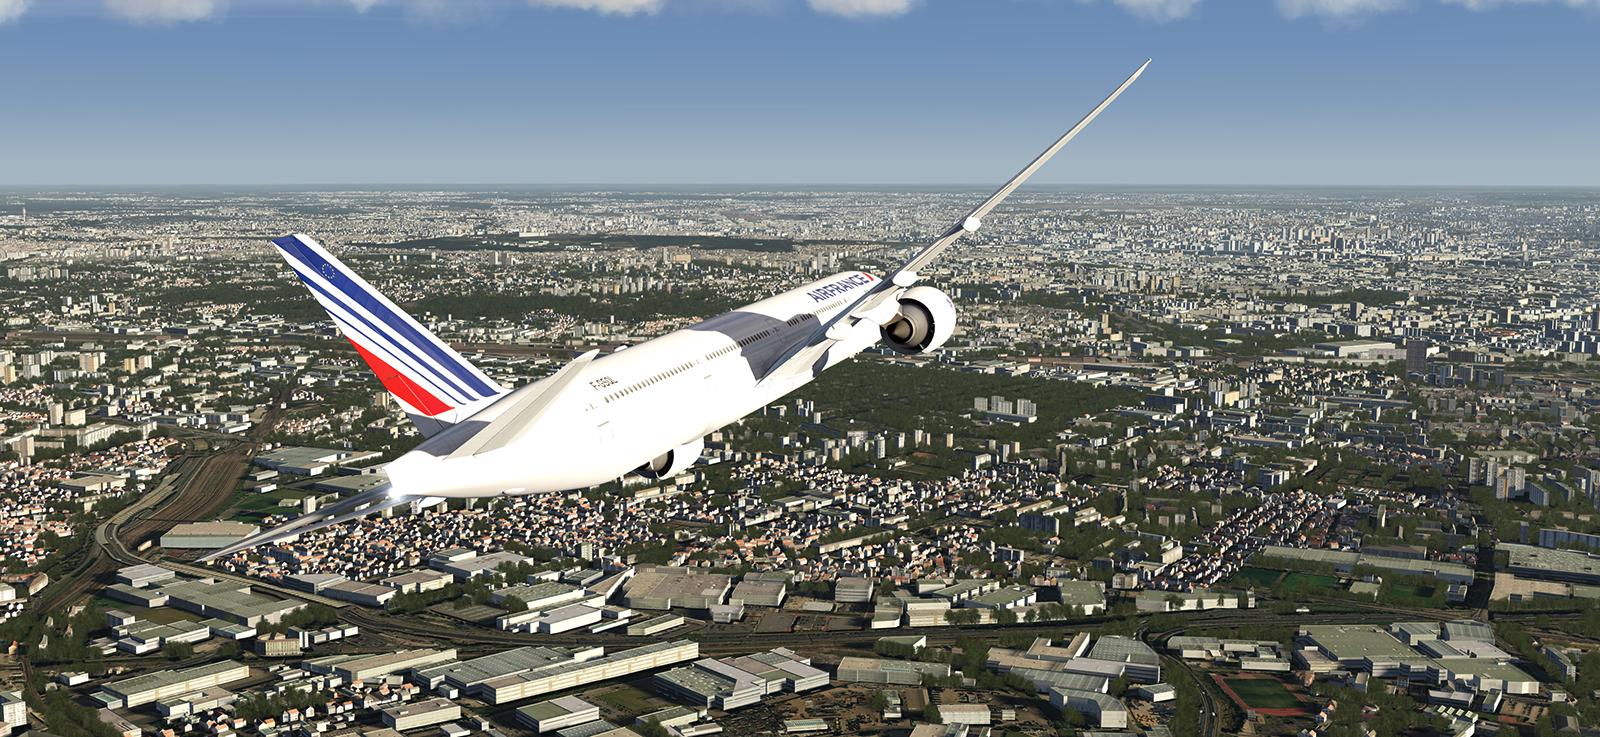 aerofly_fs_2_screenshot_11_20200201-0014